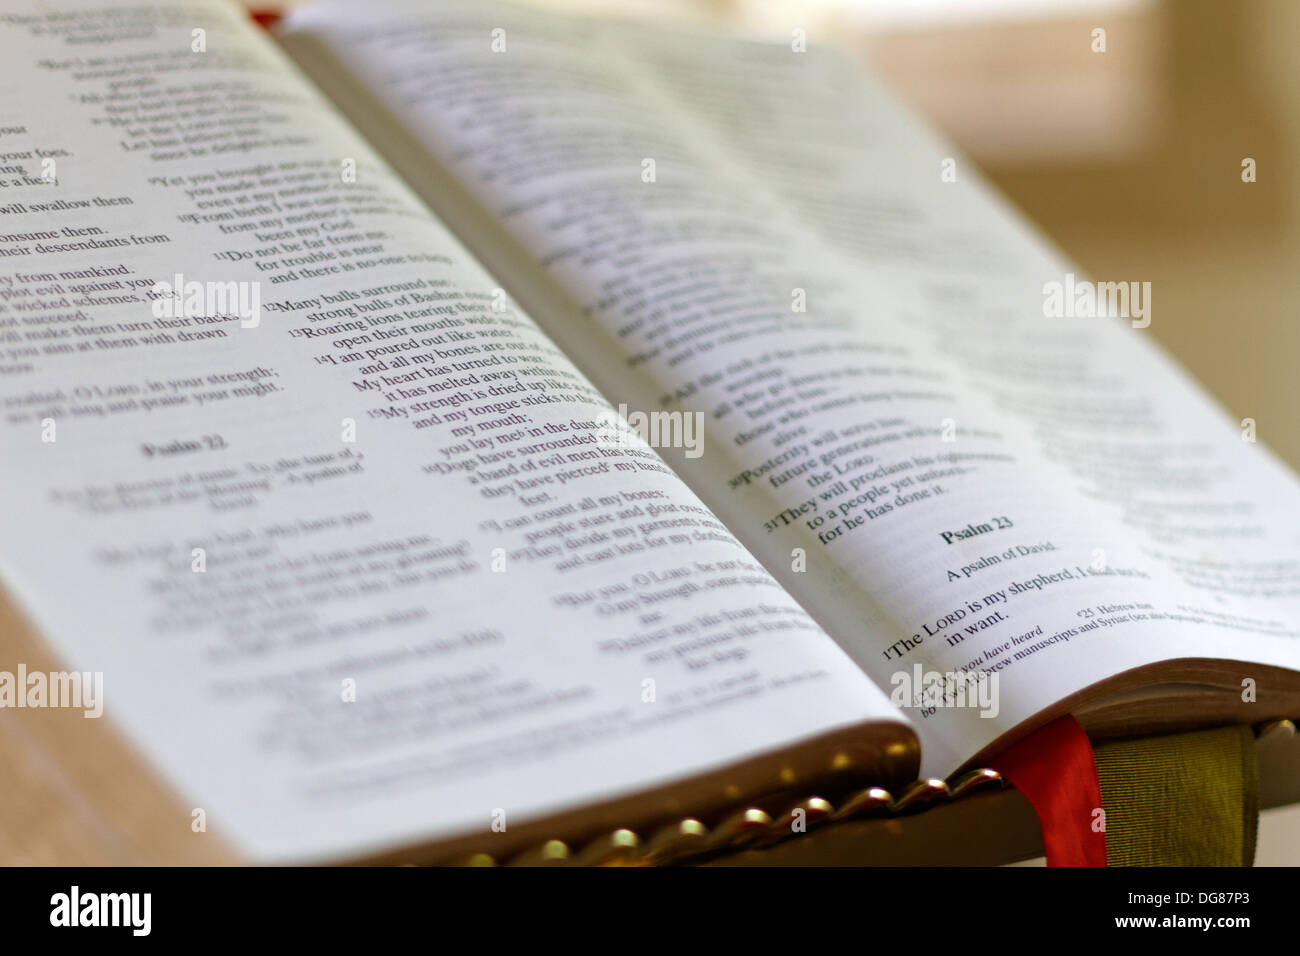 Psalm 23 Stock Photos & Psalm 23 Stock Images - Alamy